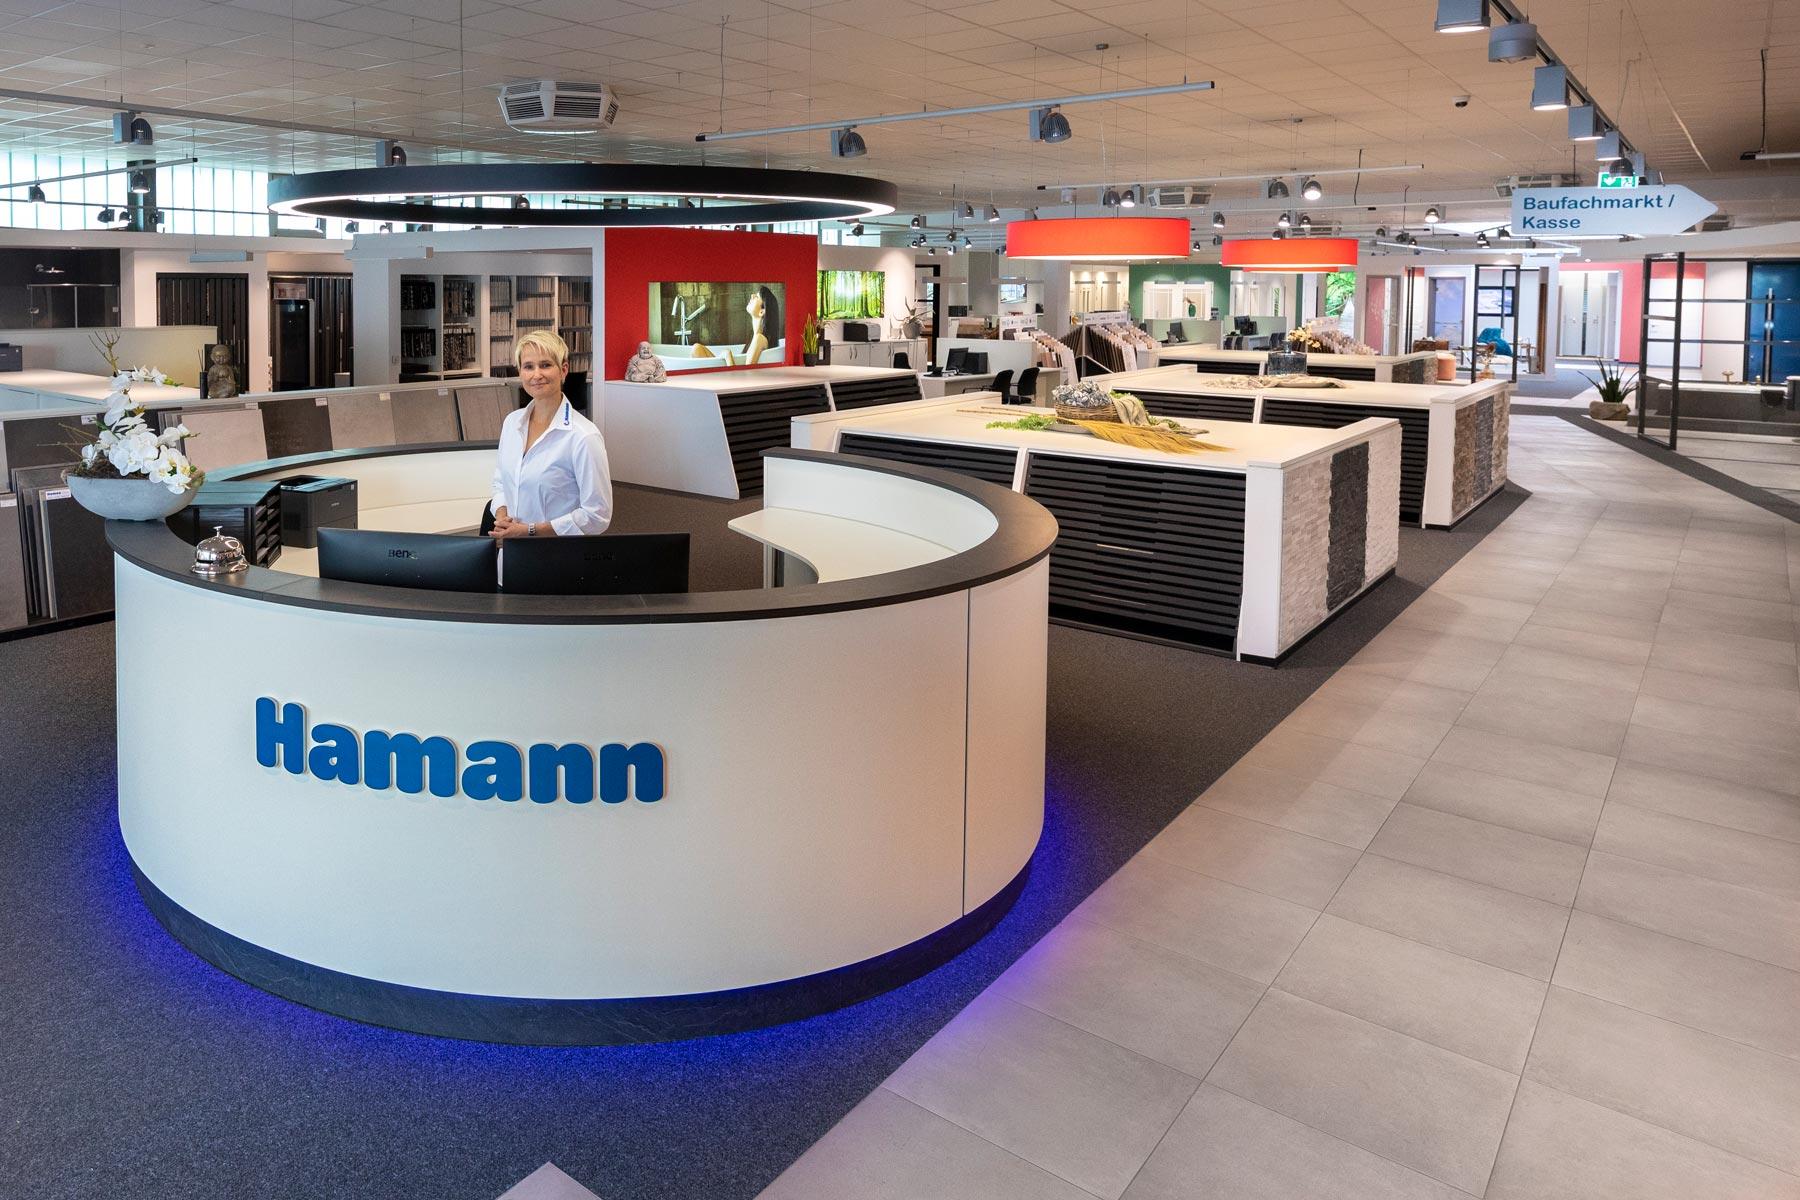 Hamann-Rezeption-Frau-lächelt-hero-3-2